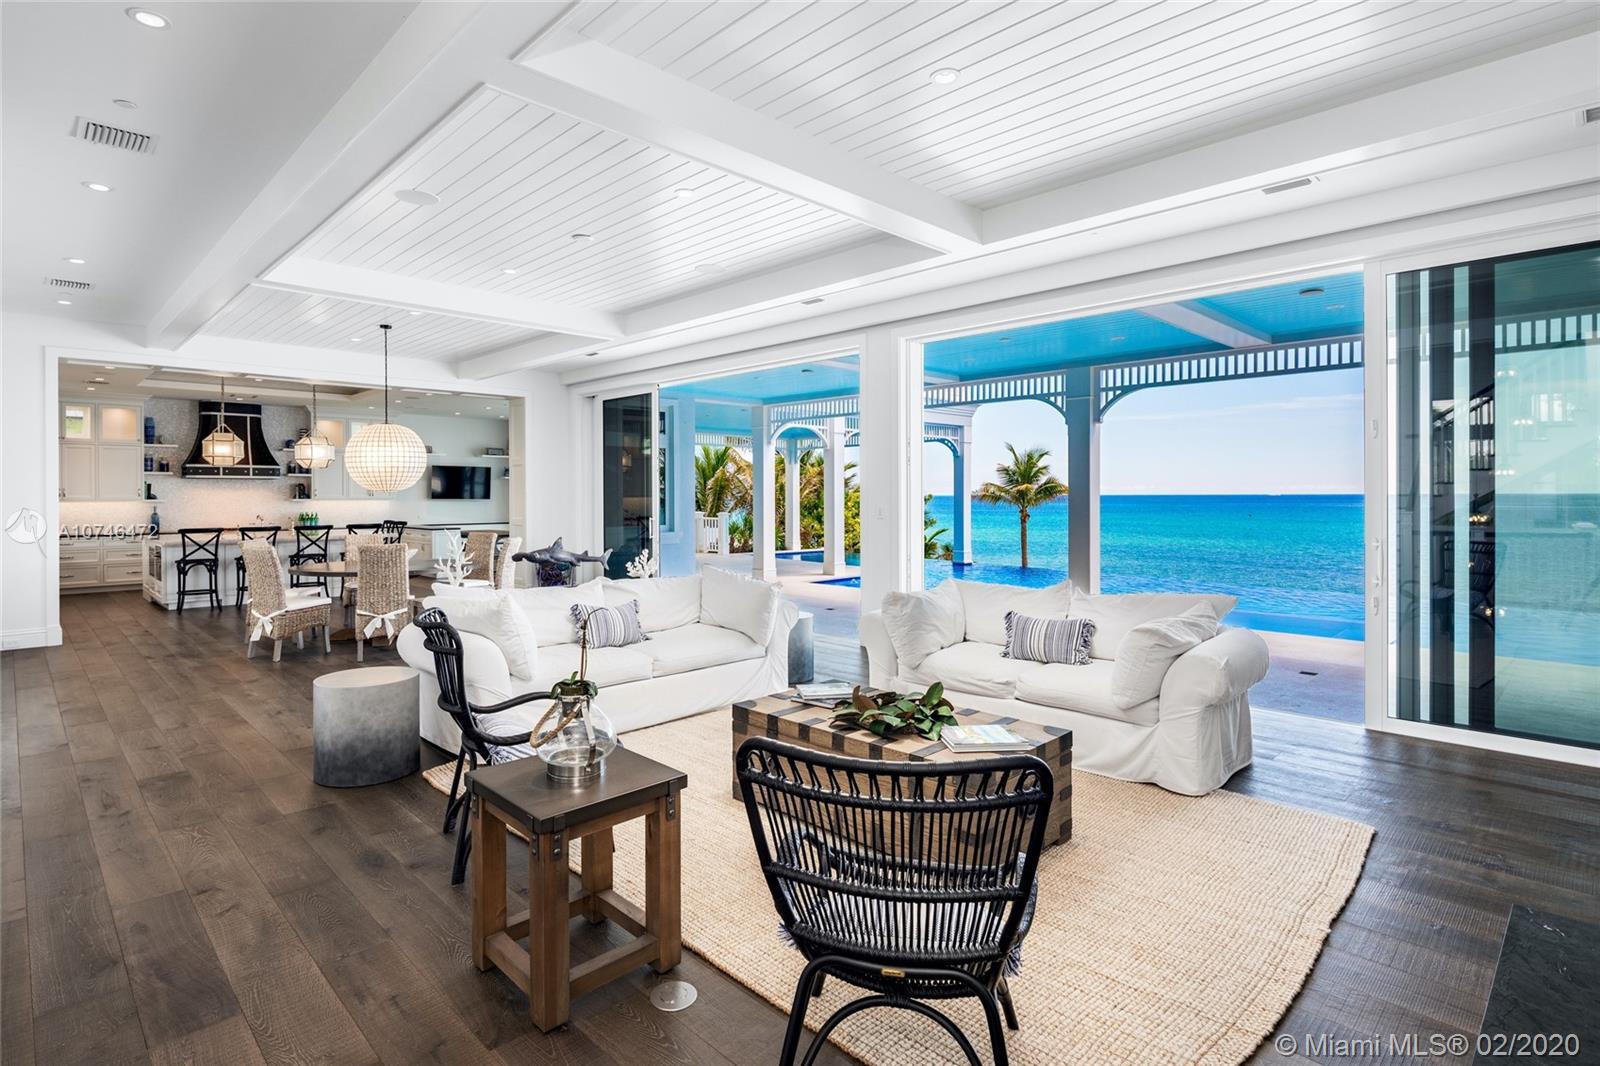 image #1 of property, Highland Beach